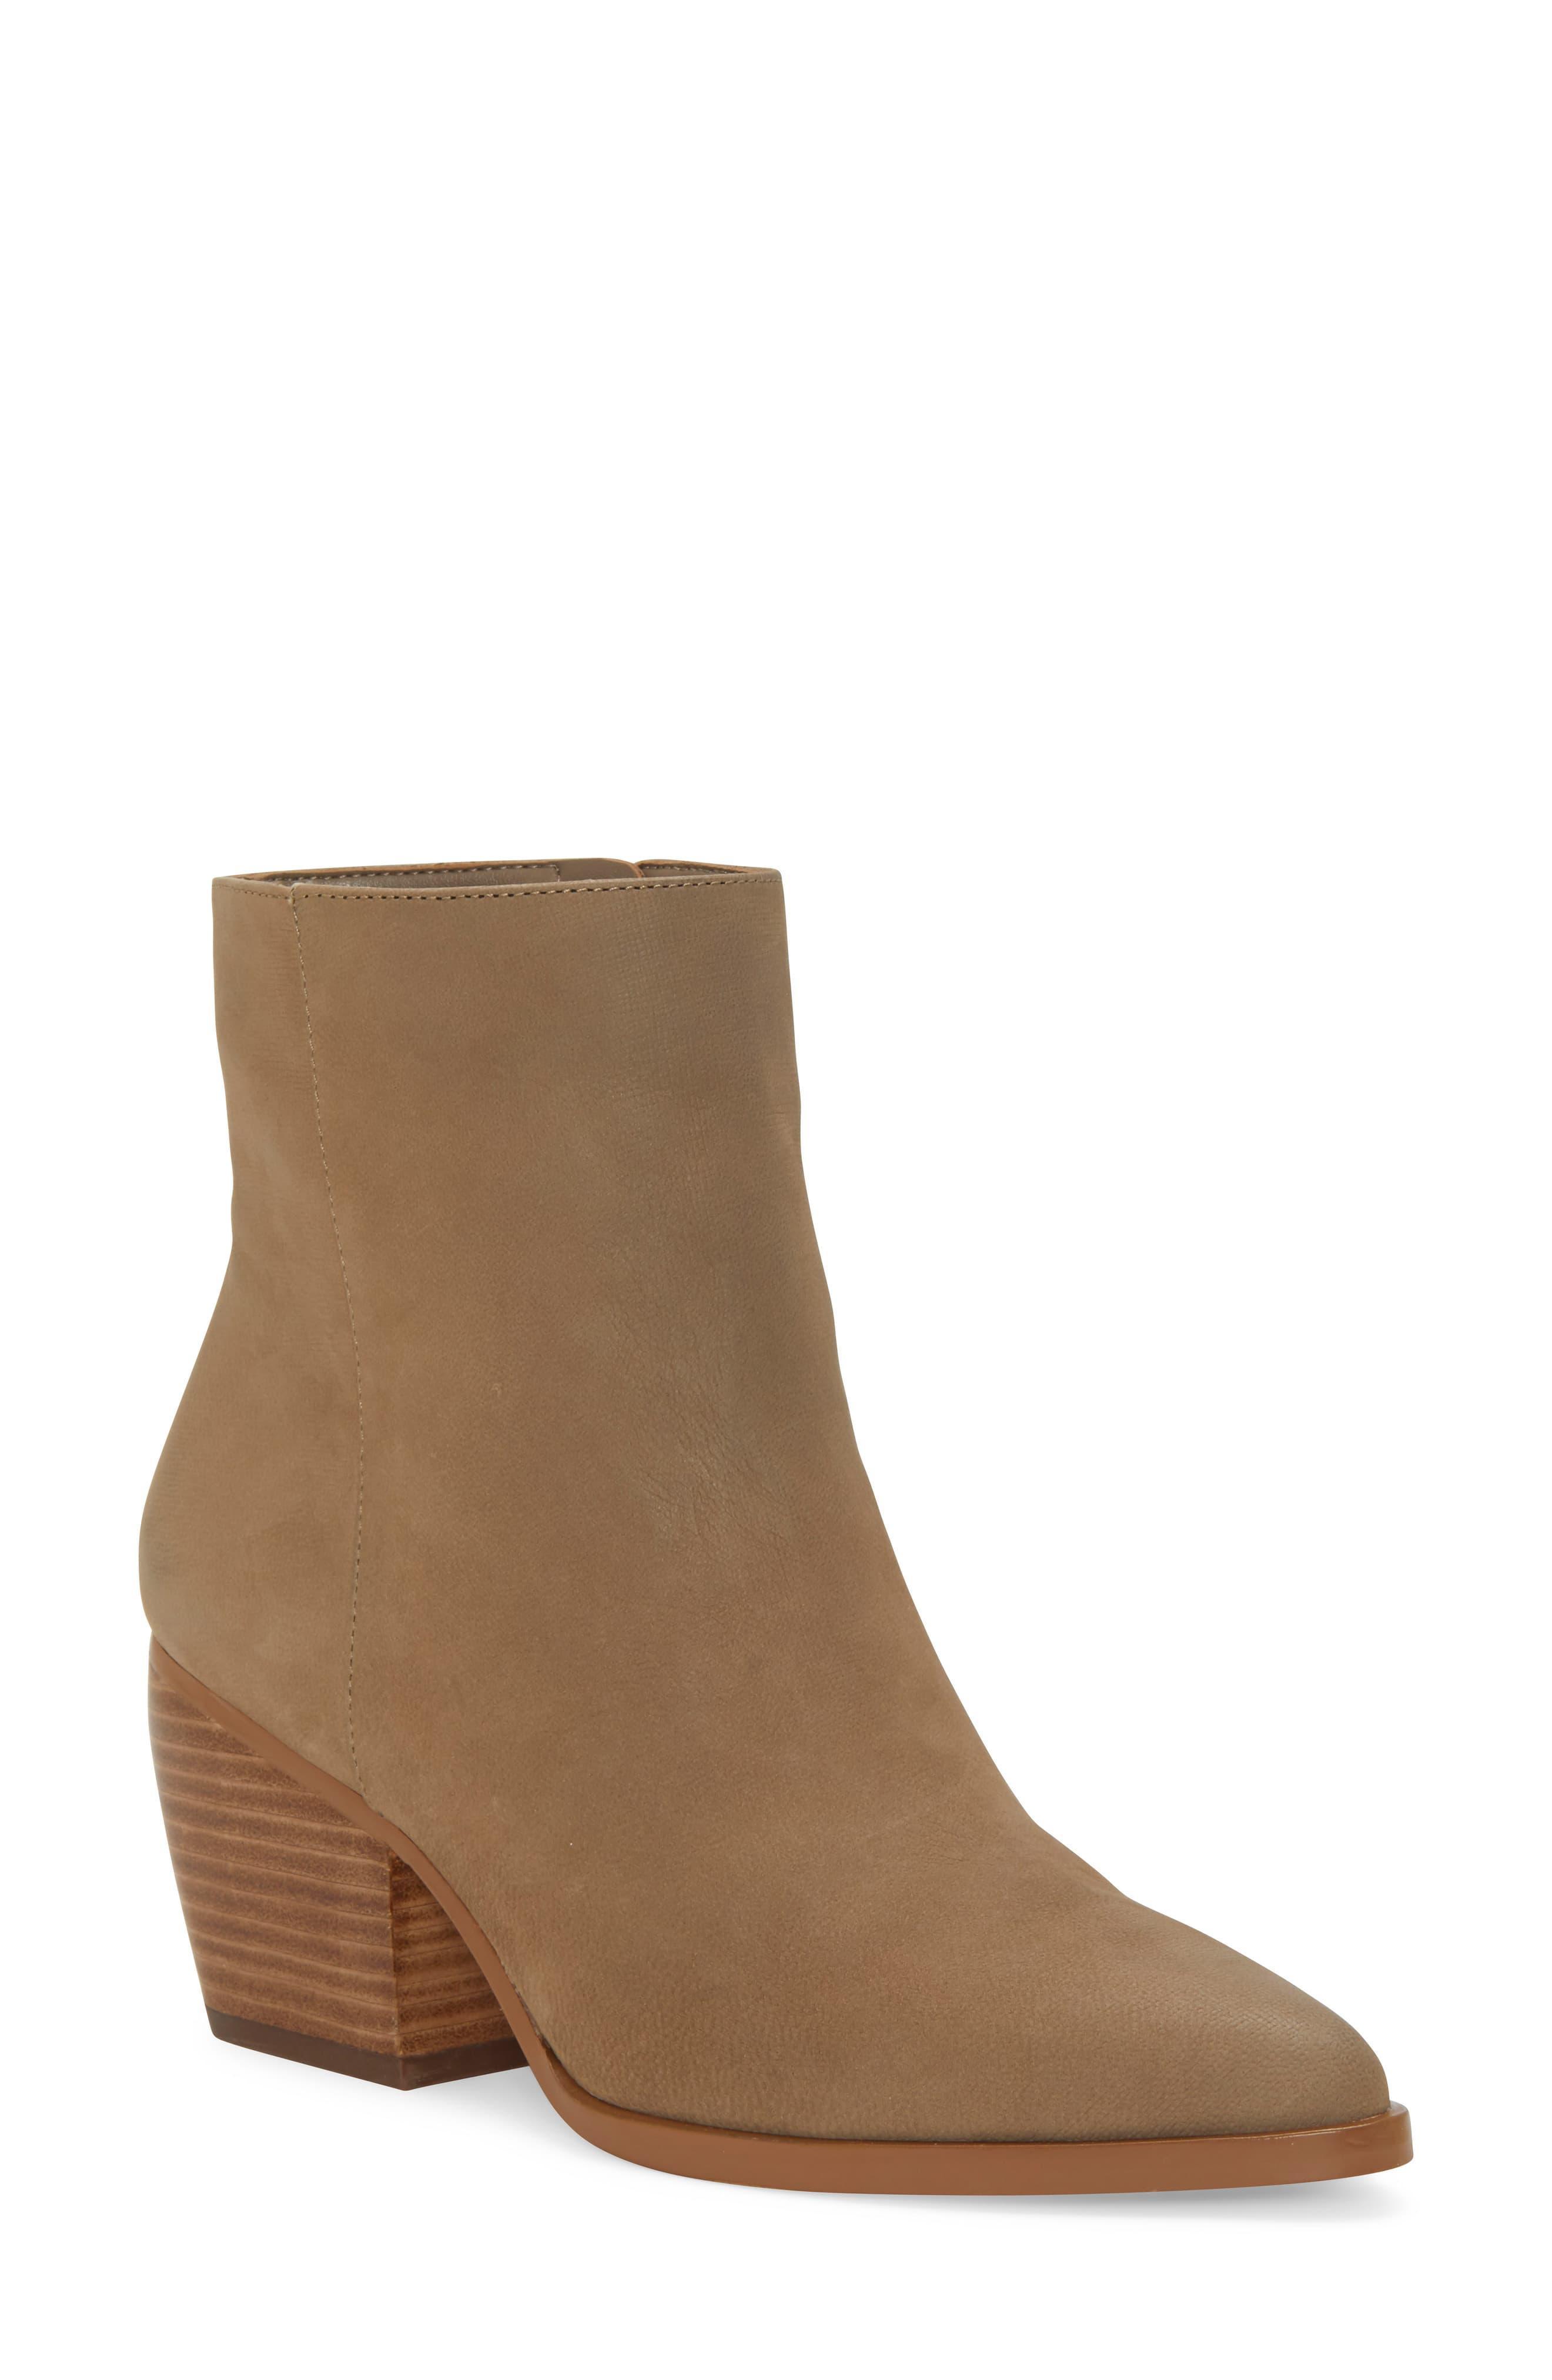 a71a1df661e Women's Brown Mabbin Block Heel Bootie